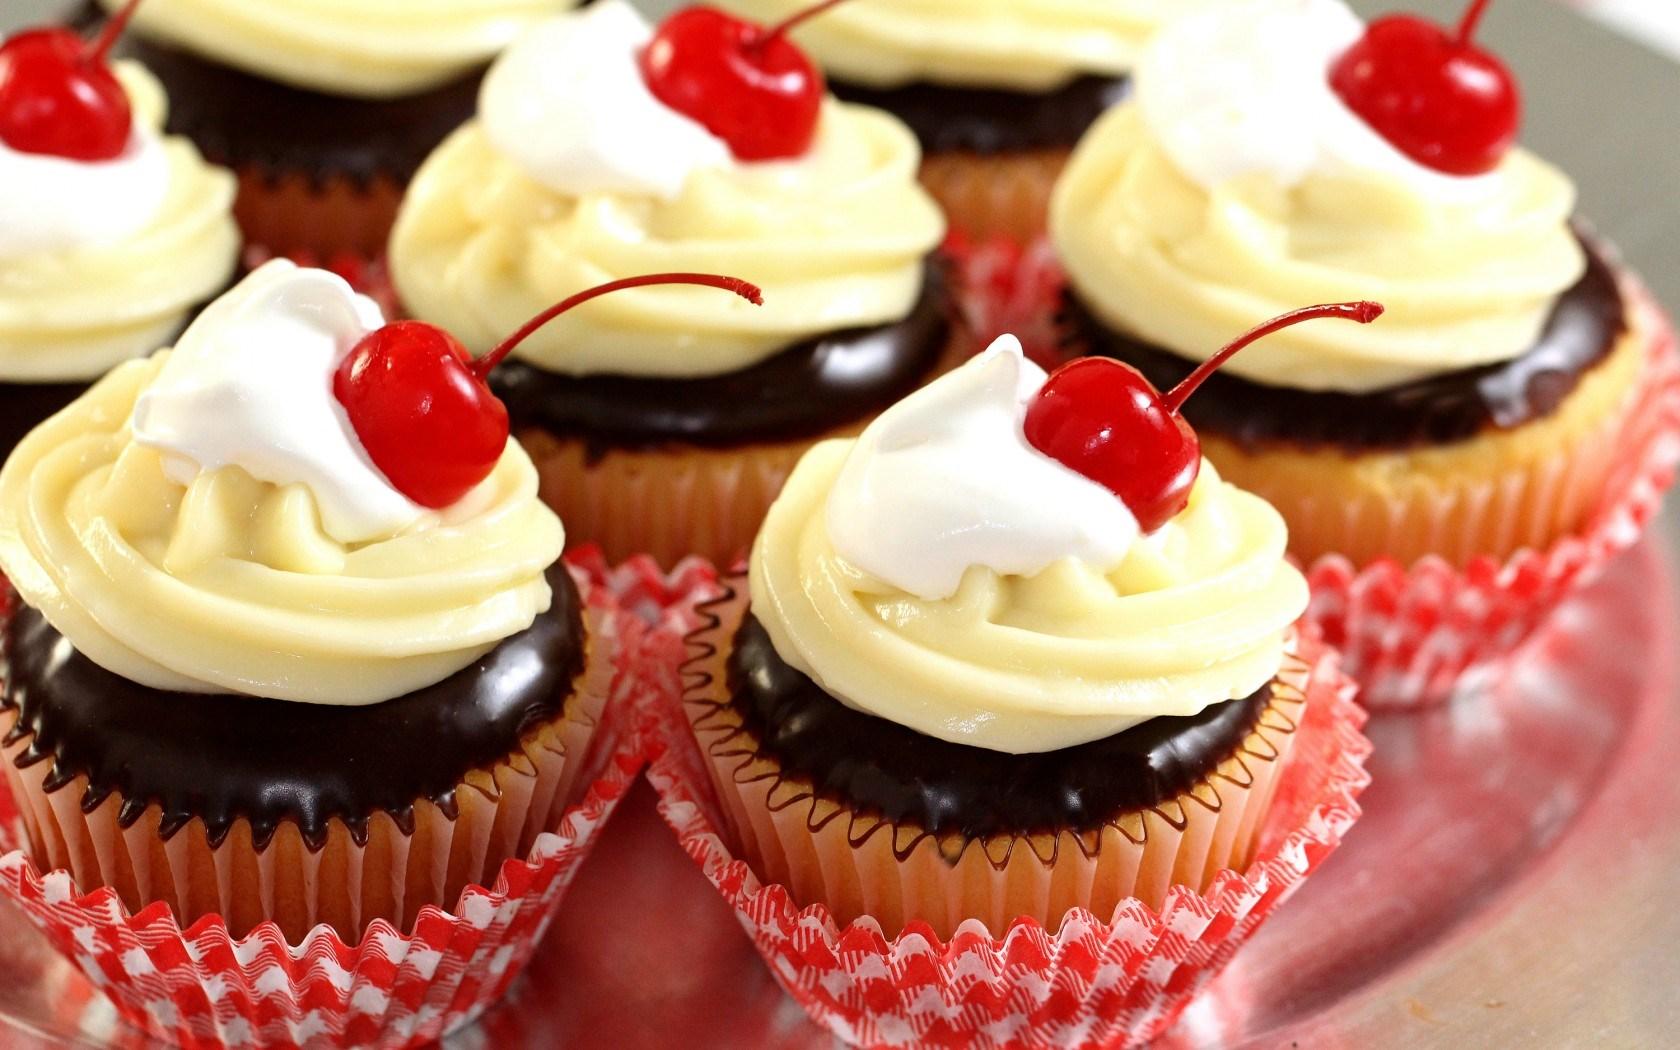 Cakes Cream Chocolate Frosting Cherry